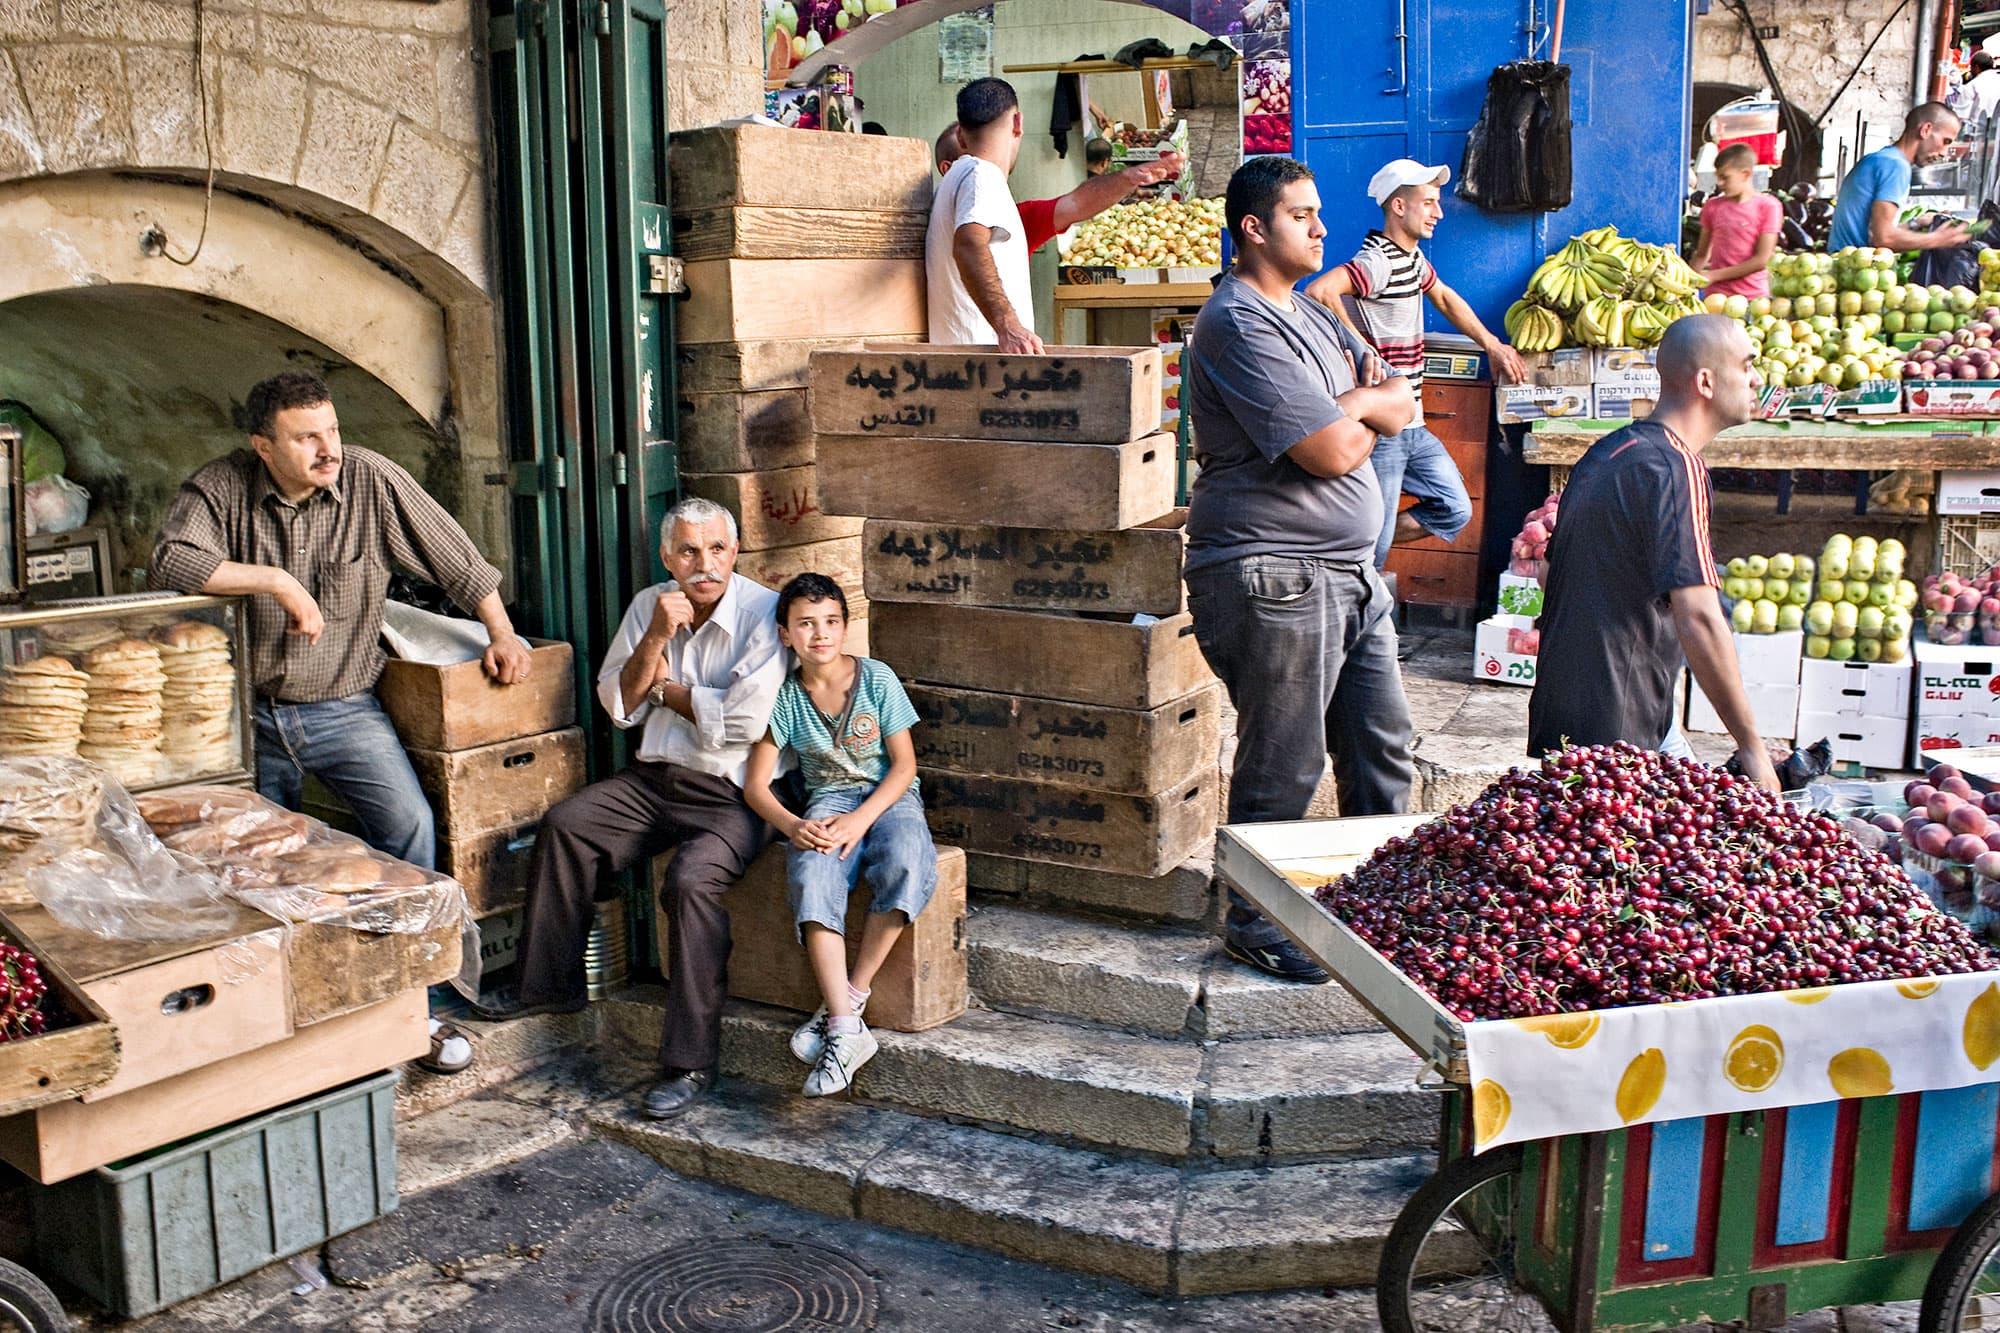 arthur-lazar-Muslim-Quarter-Jerusalem